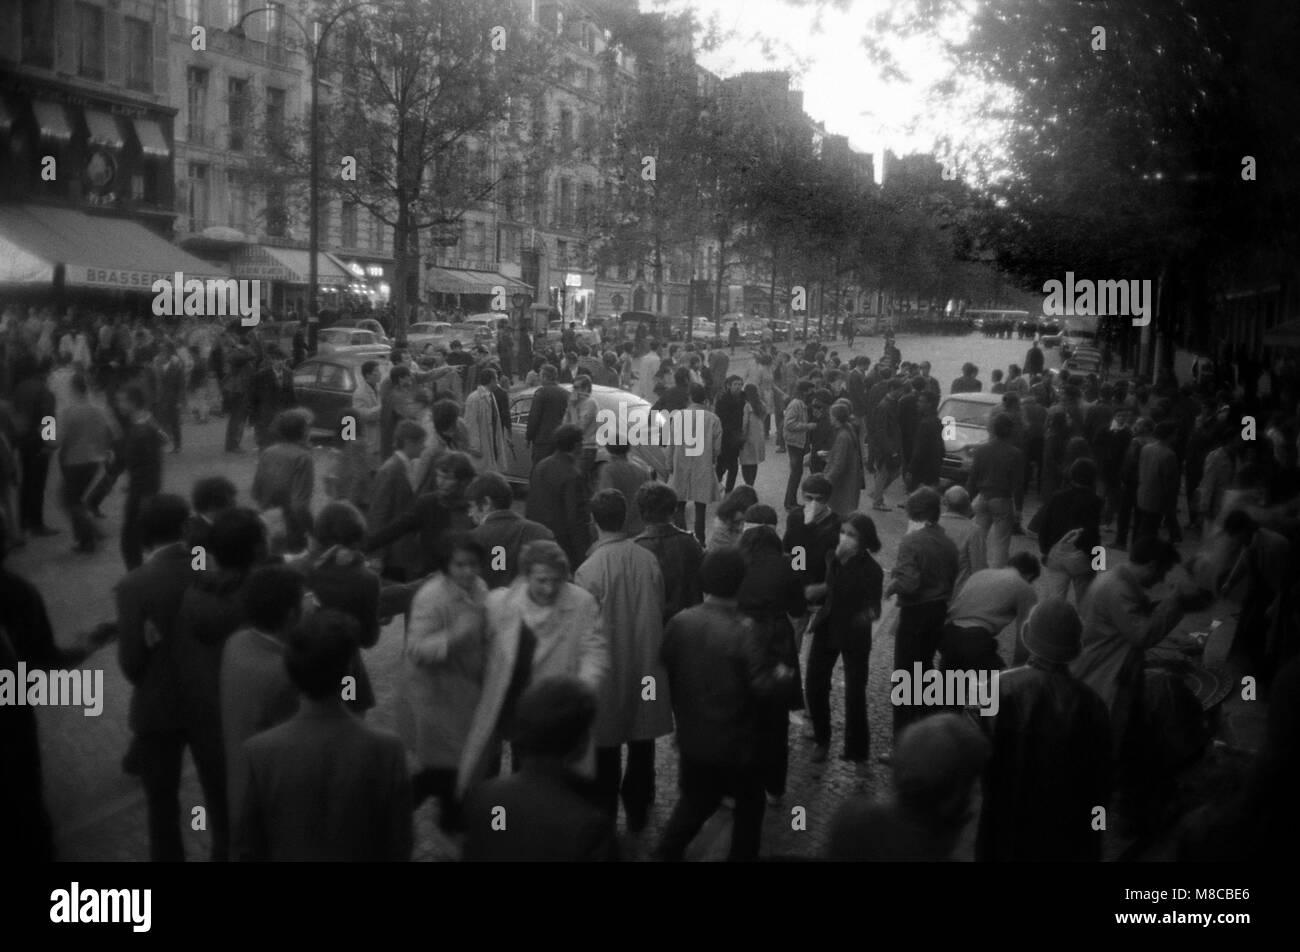 Philippe Gras / Le Pictorium -  May 1968 -  1968  -  France / Ile-de-France (region) / Paris  -  Face to face between - Stock Image